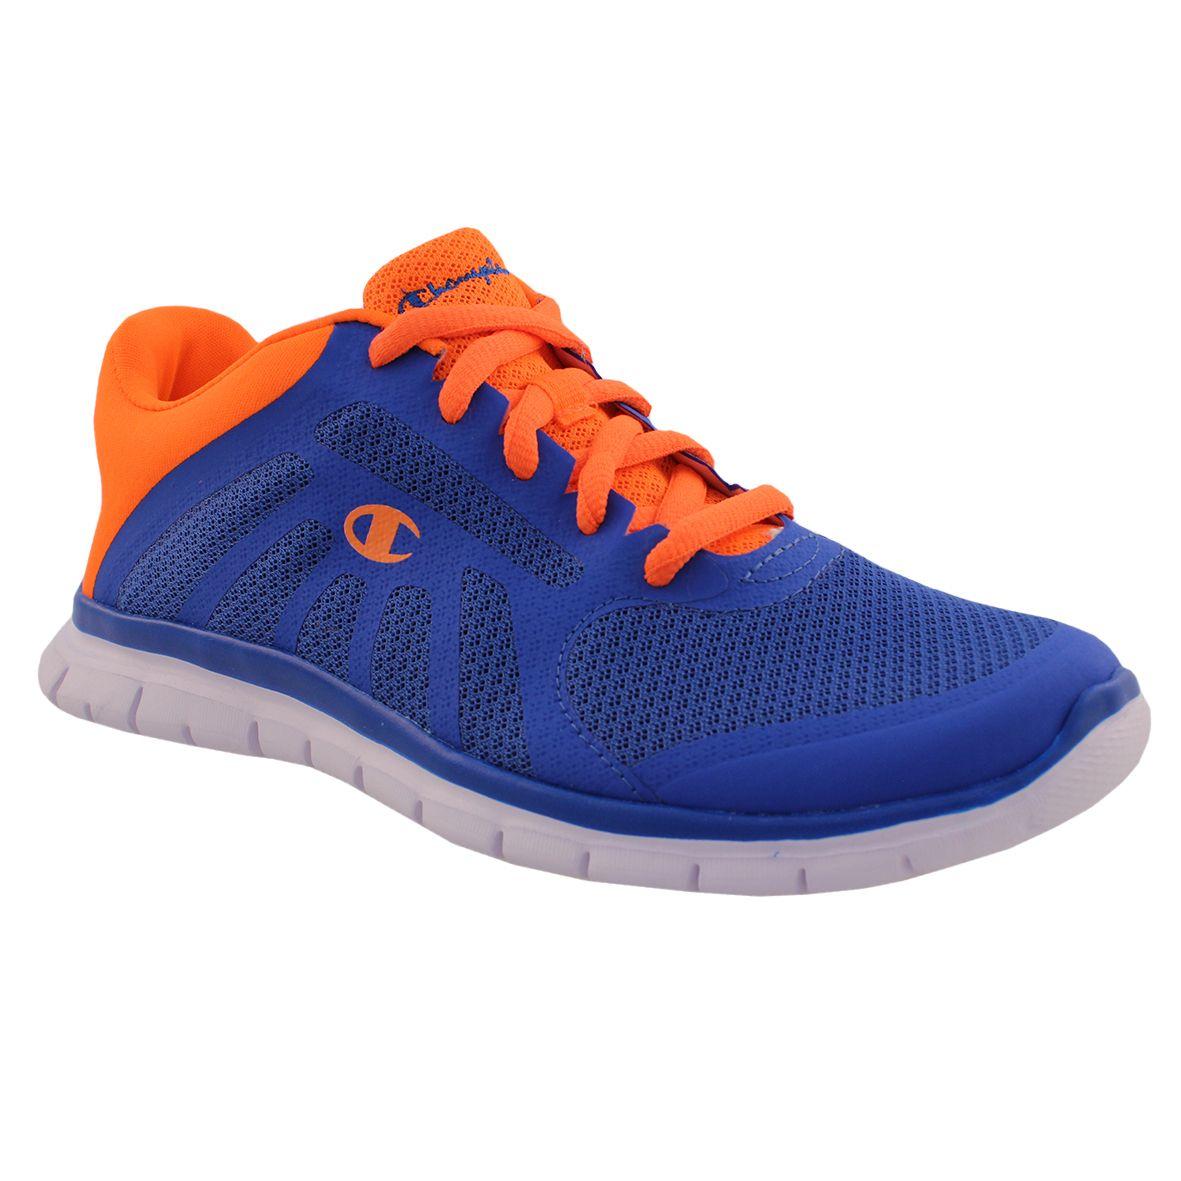 f5352b40d941 champion shoes - Google Search